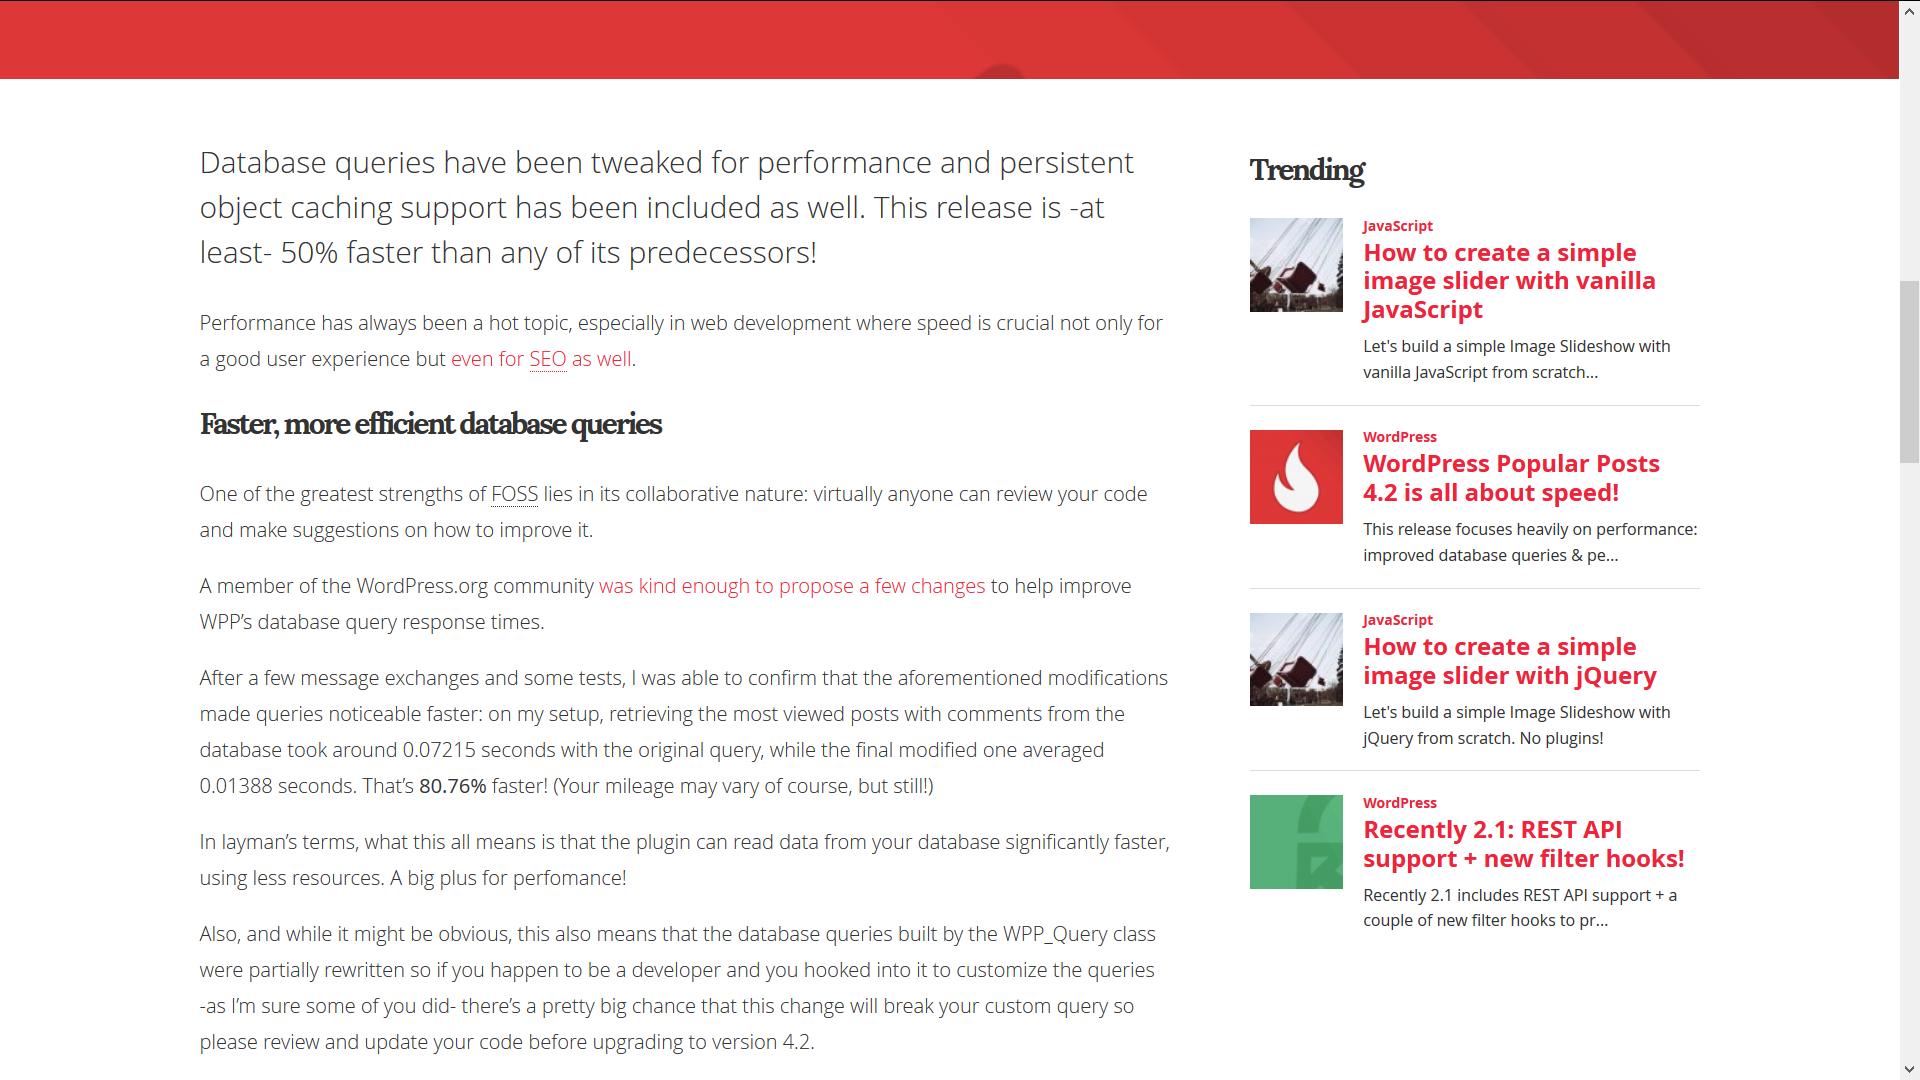 The WordPress Popular Posts Widget on theme's sidebar.